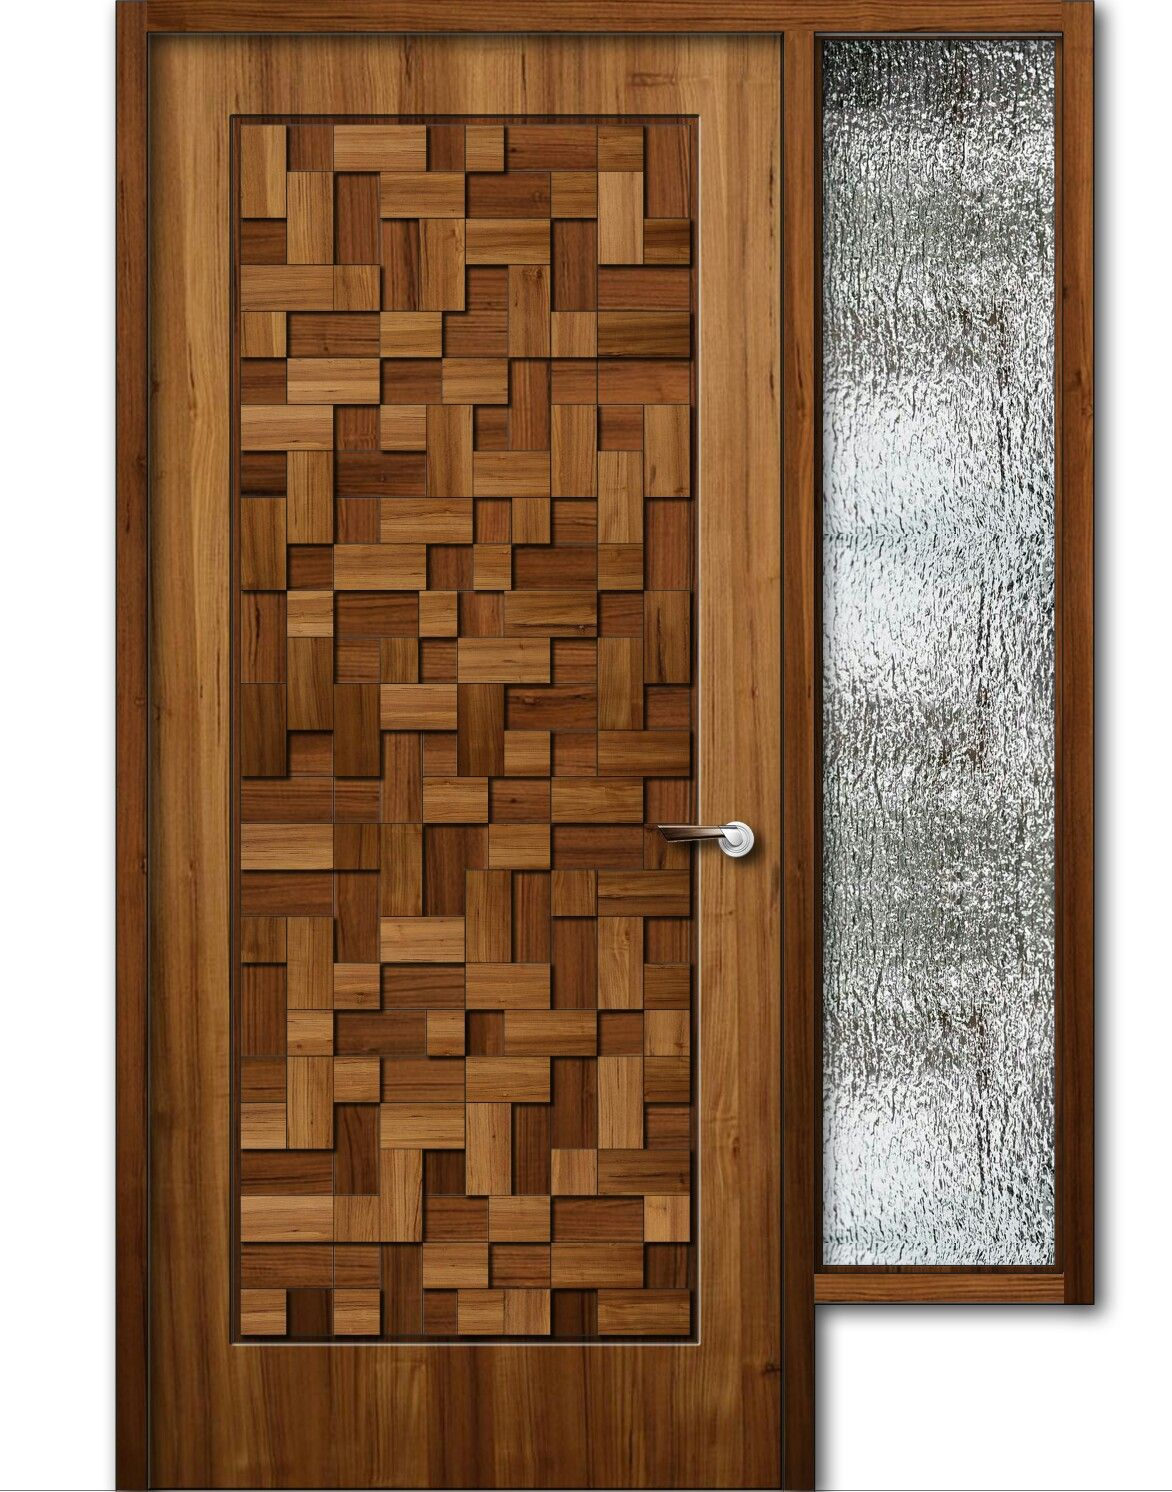 Teak Wood Finish Wooden Door With Window 8feet Height Modern